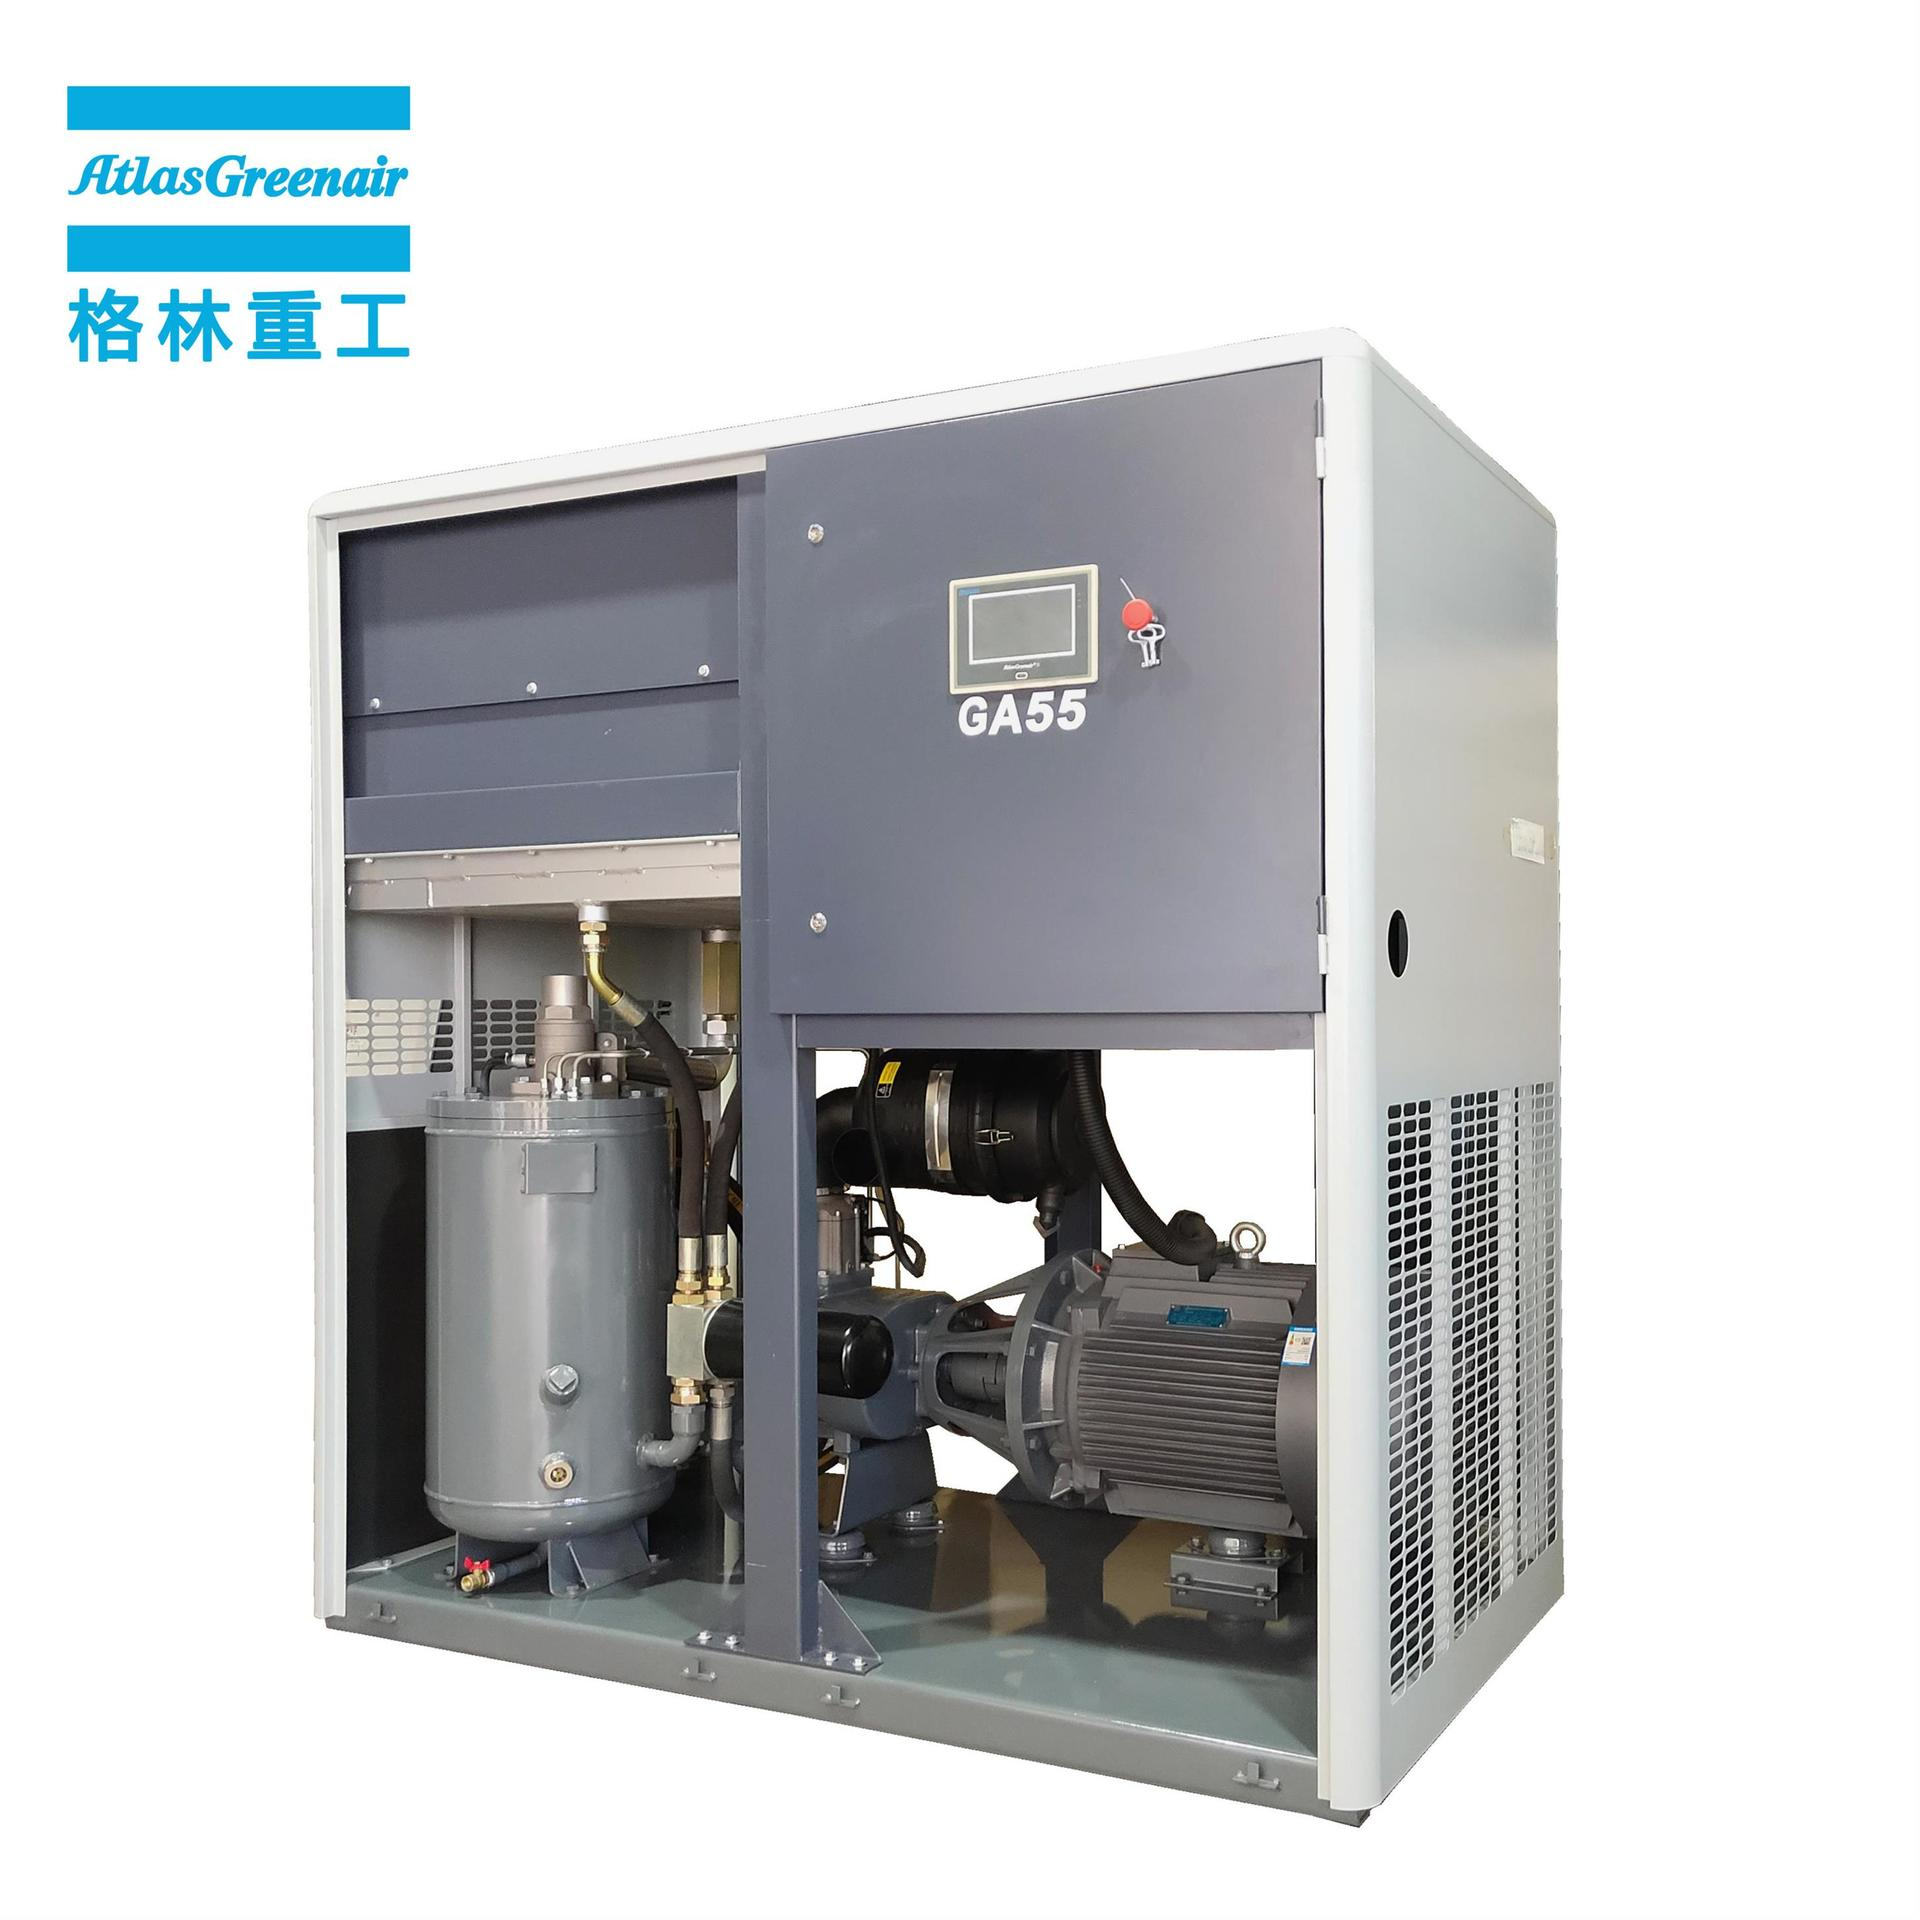 Atlas Greenair GA55 Electrical Oil Injected Stationary Screw Air Compressor